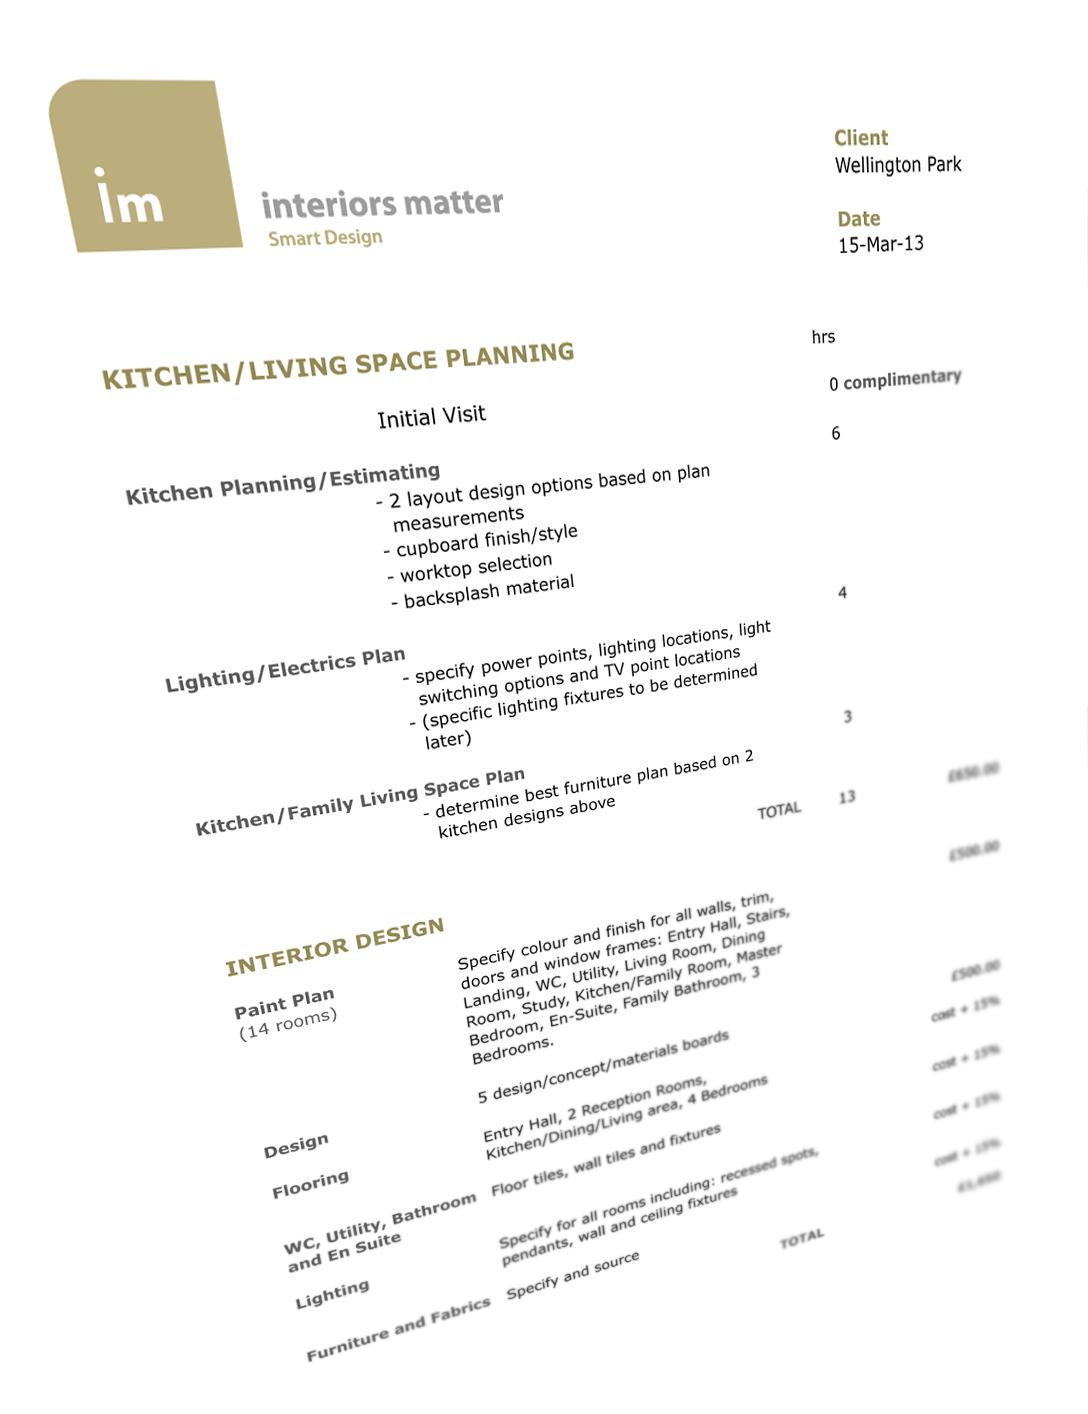 Project Estimate | www.interiorsmatter.com